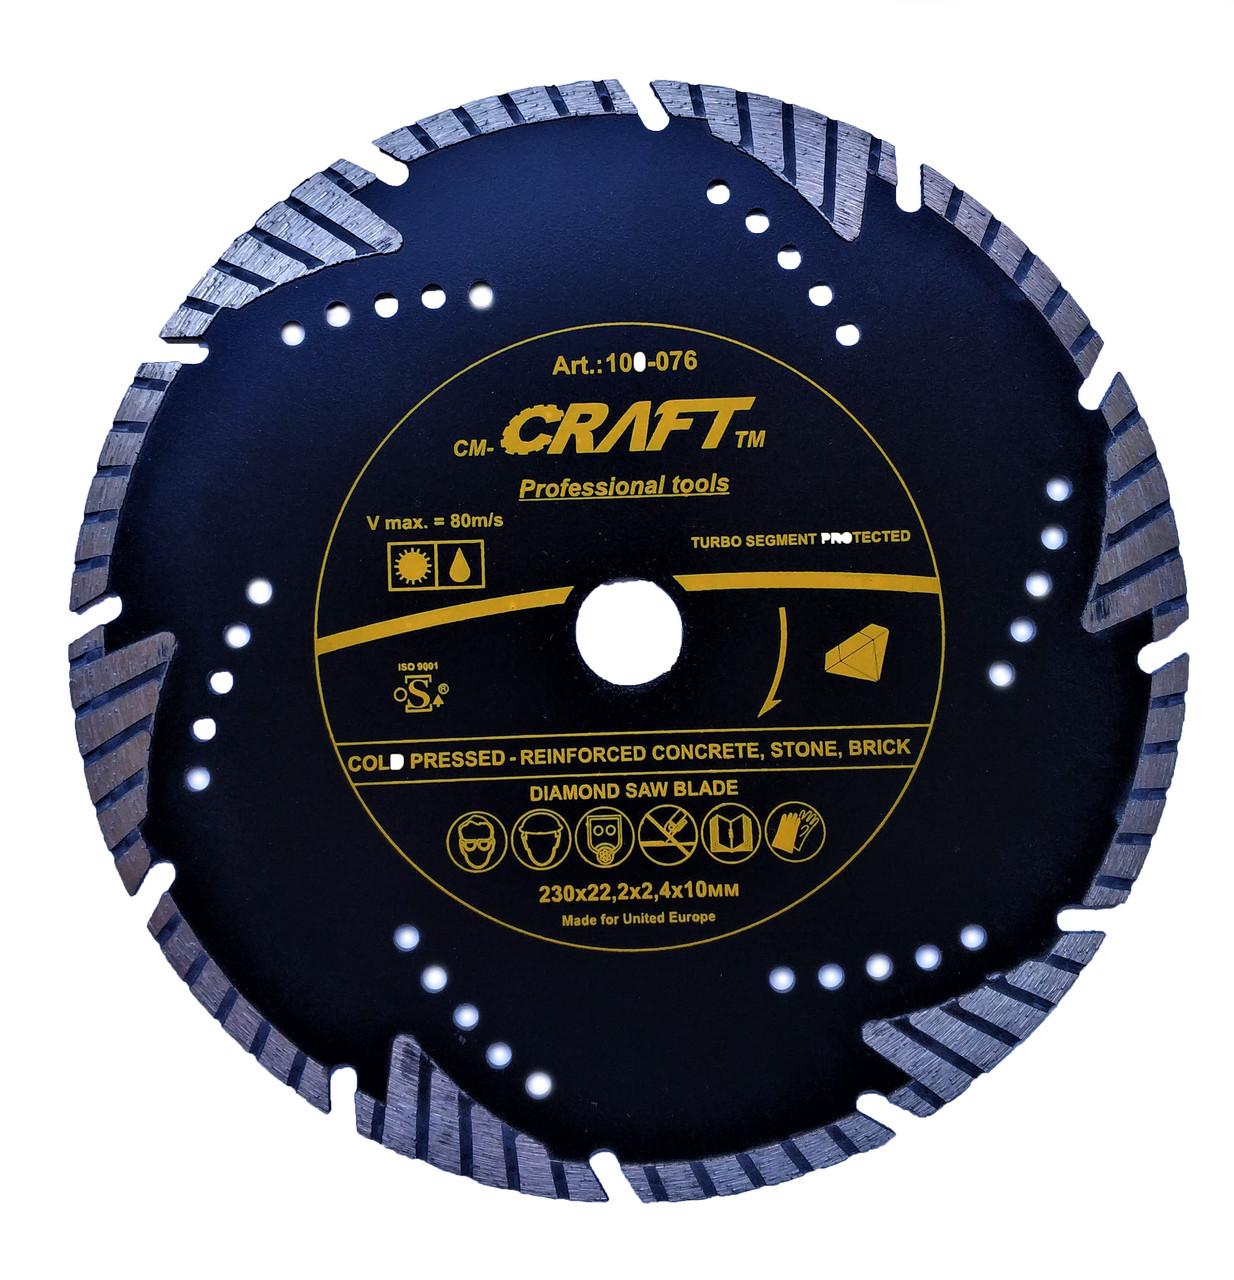 76 Диск алмазний Craft  turbo segment protekted 230*22.2*2.4*10мм - сух/мокр глиб різ каменю